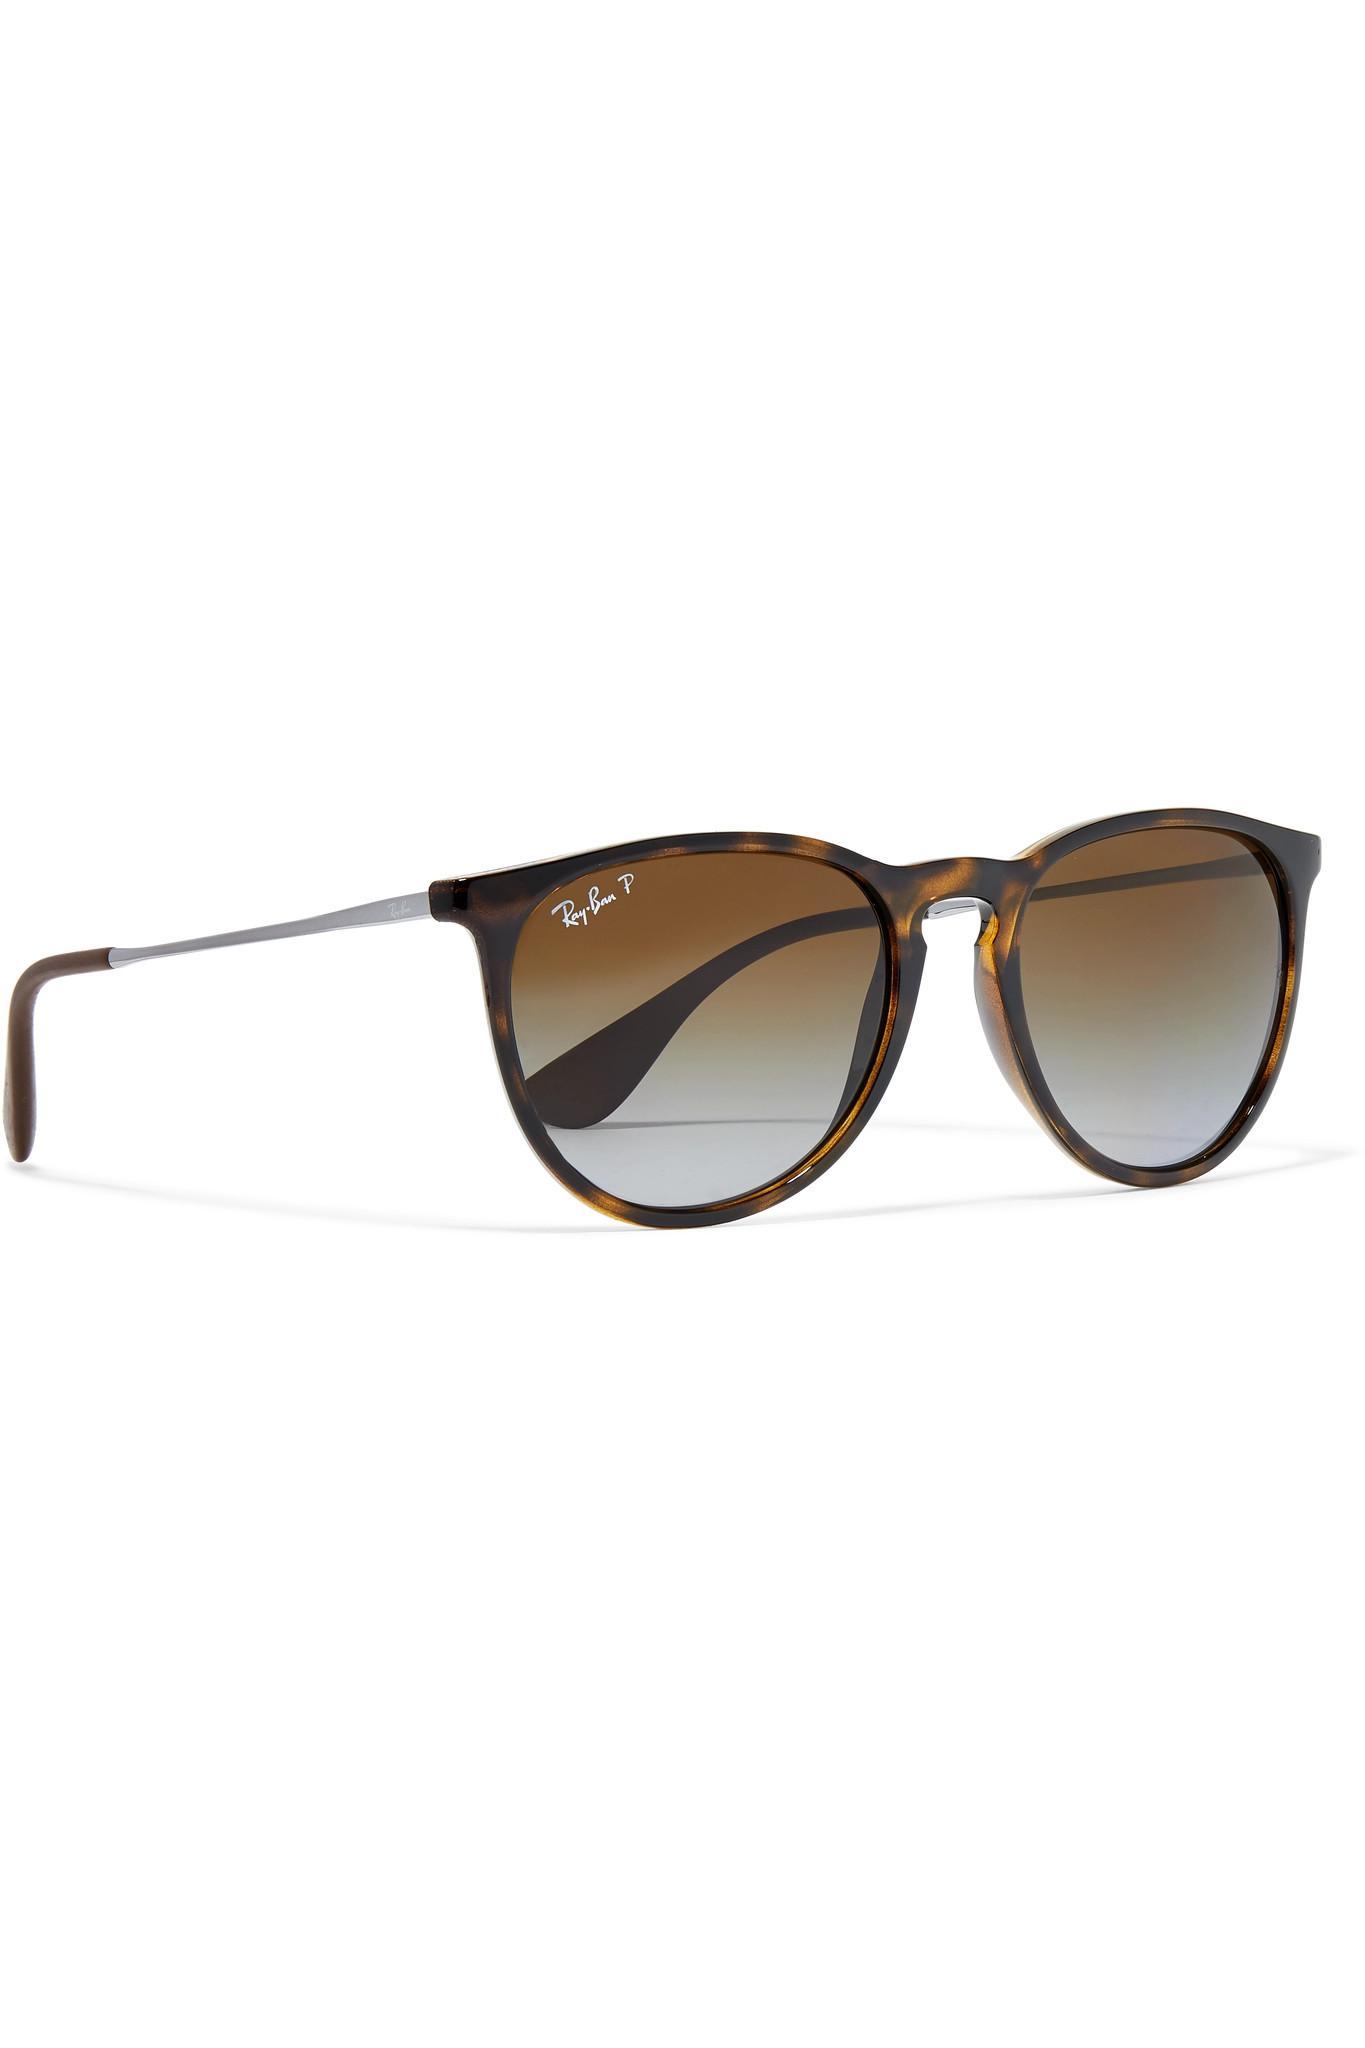 aca9962983 Ray-Ban - Multicolor Round-frame Tortoiseshell Acetate And Gunmetal-tone  Sunglasses -. View fullscreen